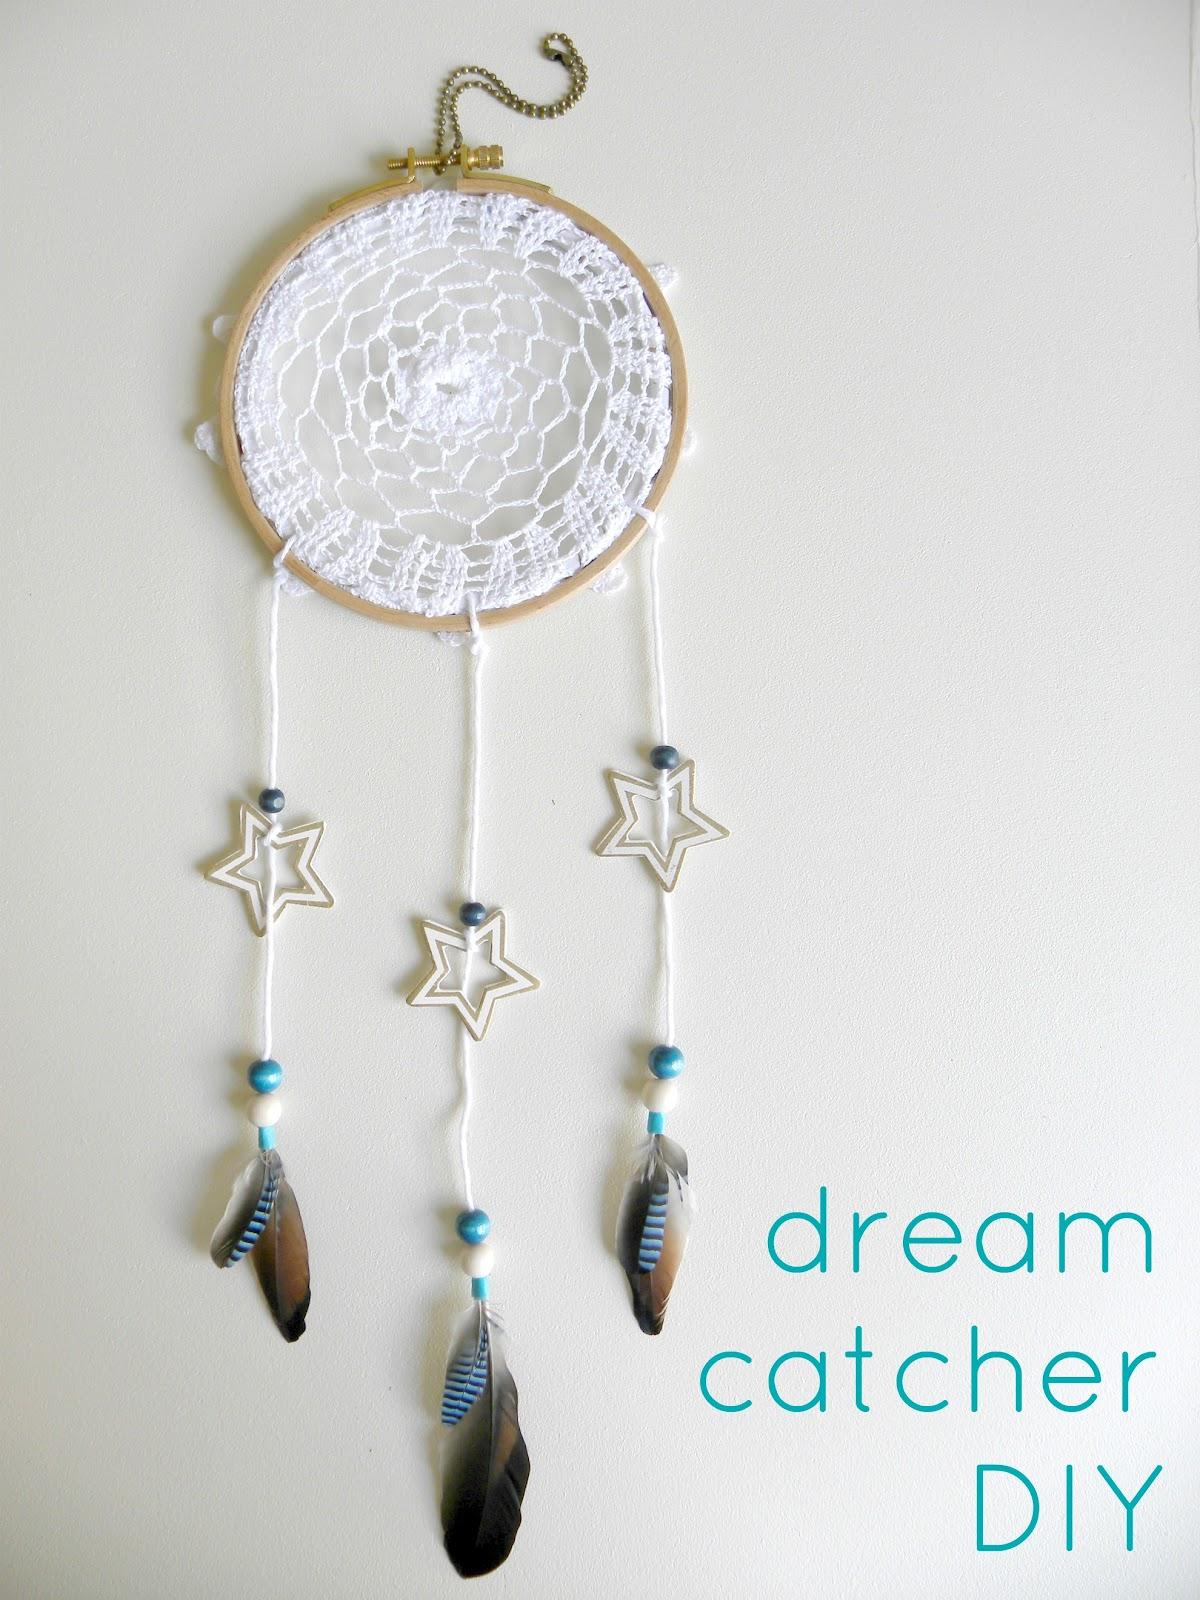 Hilatina photo tutorial dreamcatcher diy for Dreamcatcher diy tutorial